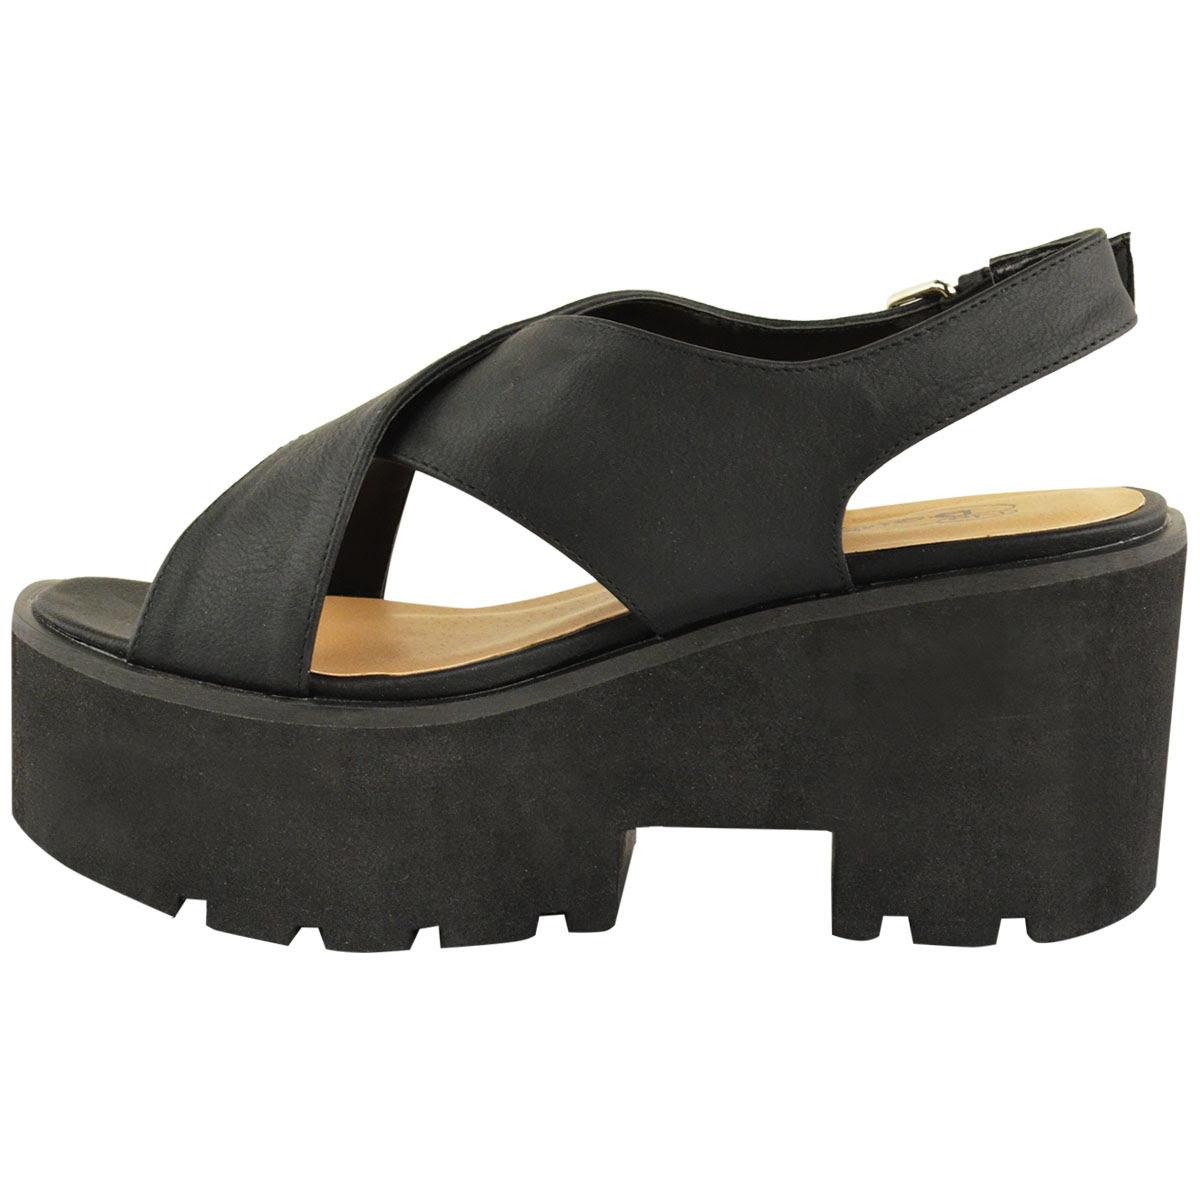 Womens platform sandals - 28 images - womens dolcis slip